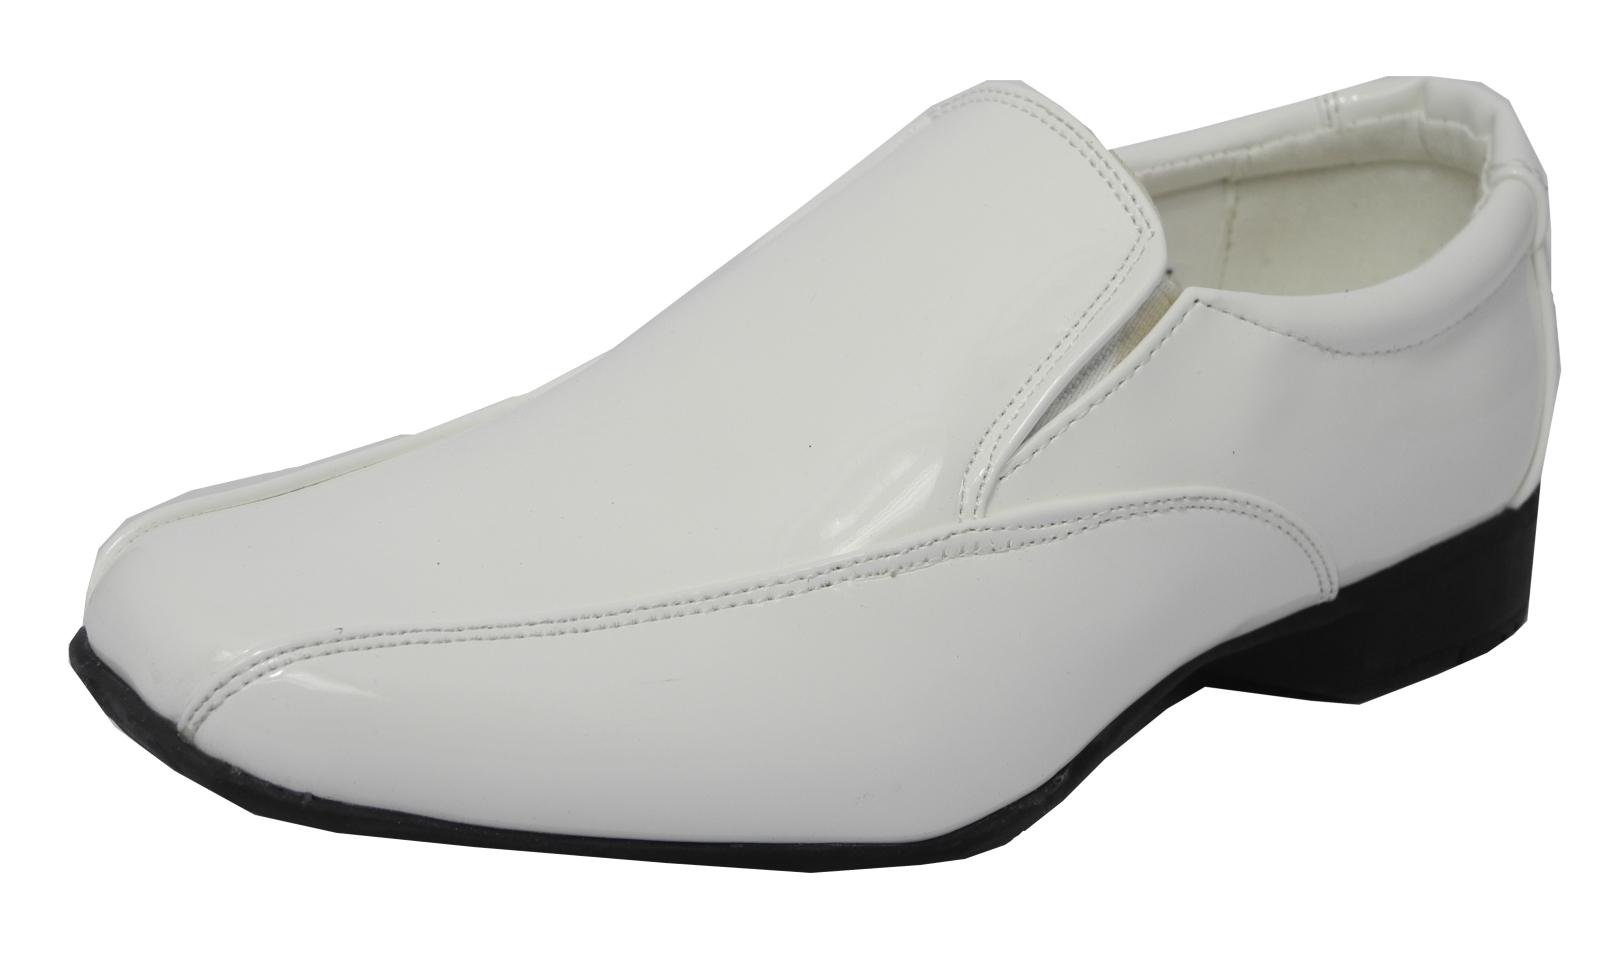 Mens Boys Size 6 5 Shiny White Dress Shoes Formal Wedding